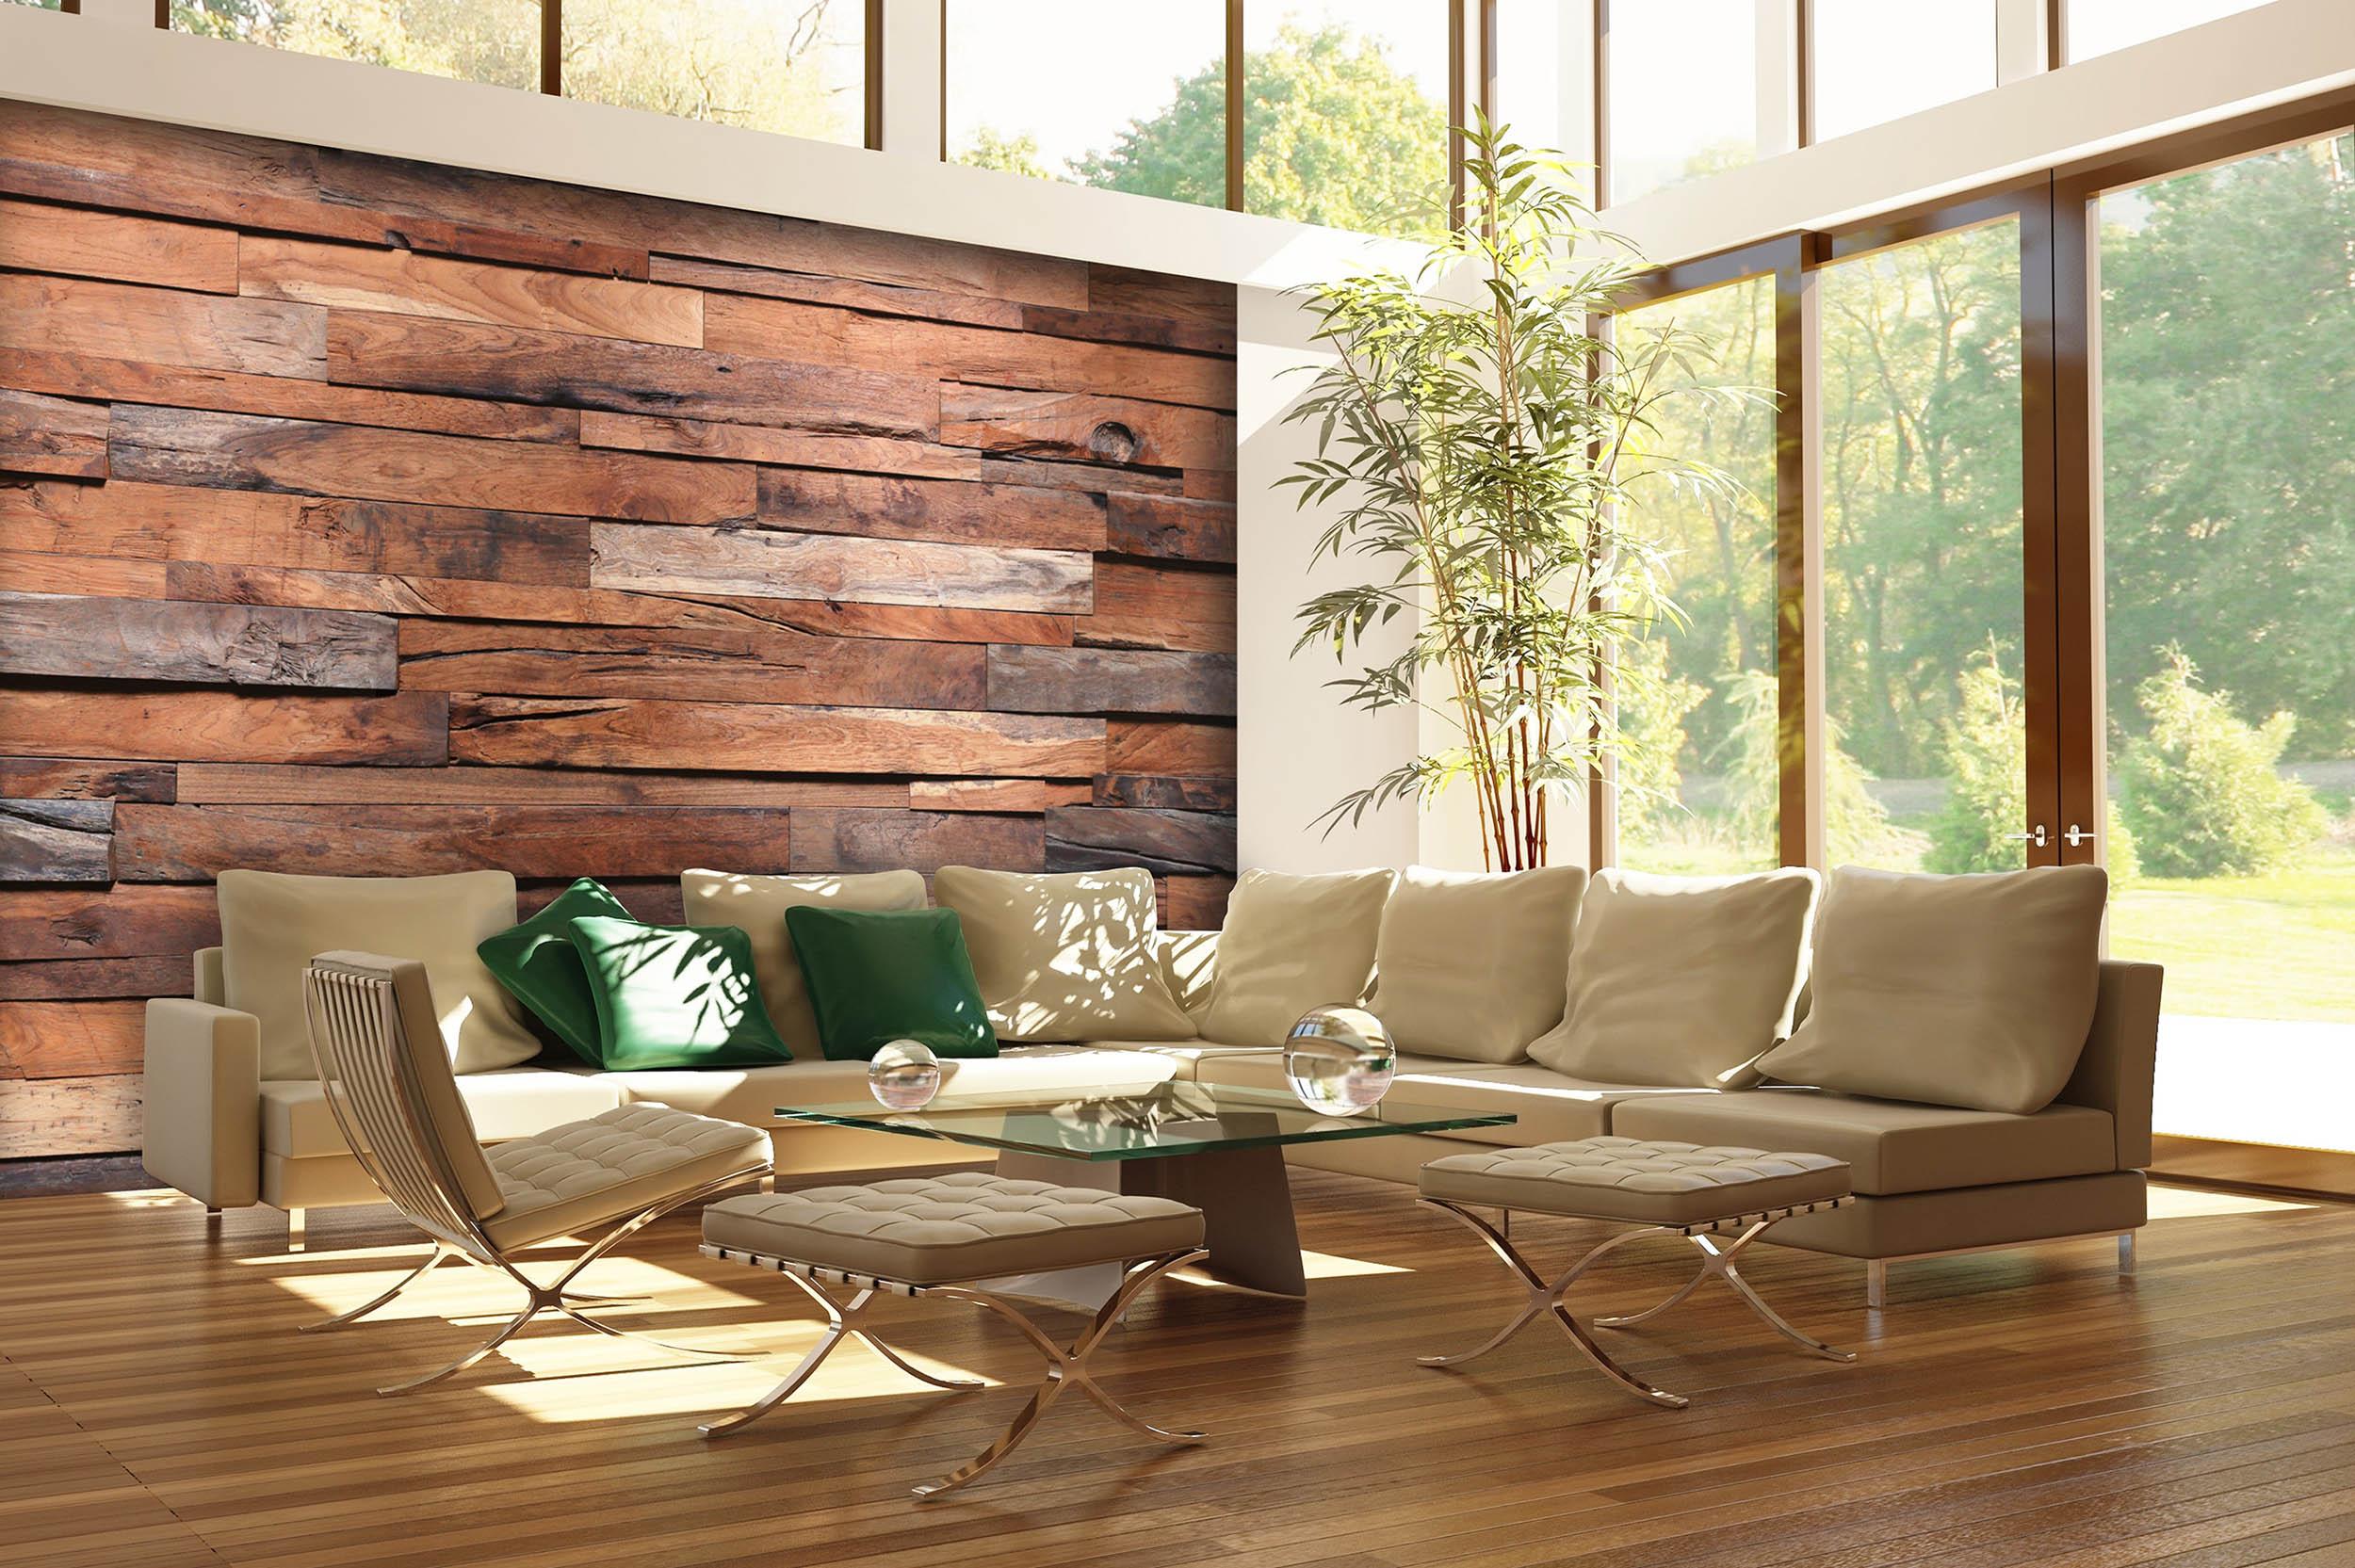 fototapete wooden wall 366 x 254cm bretterwand holz. Black Bedroom Furniture Sets. Home Design Ideas